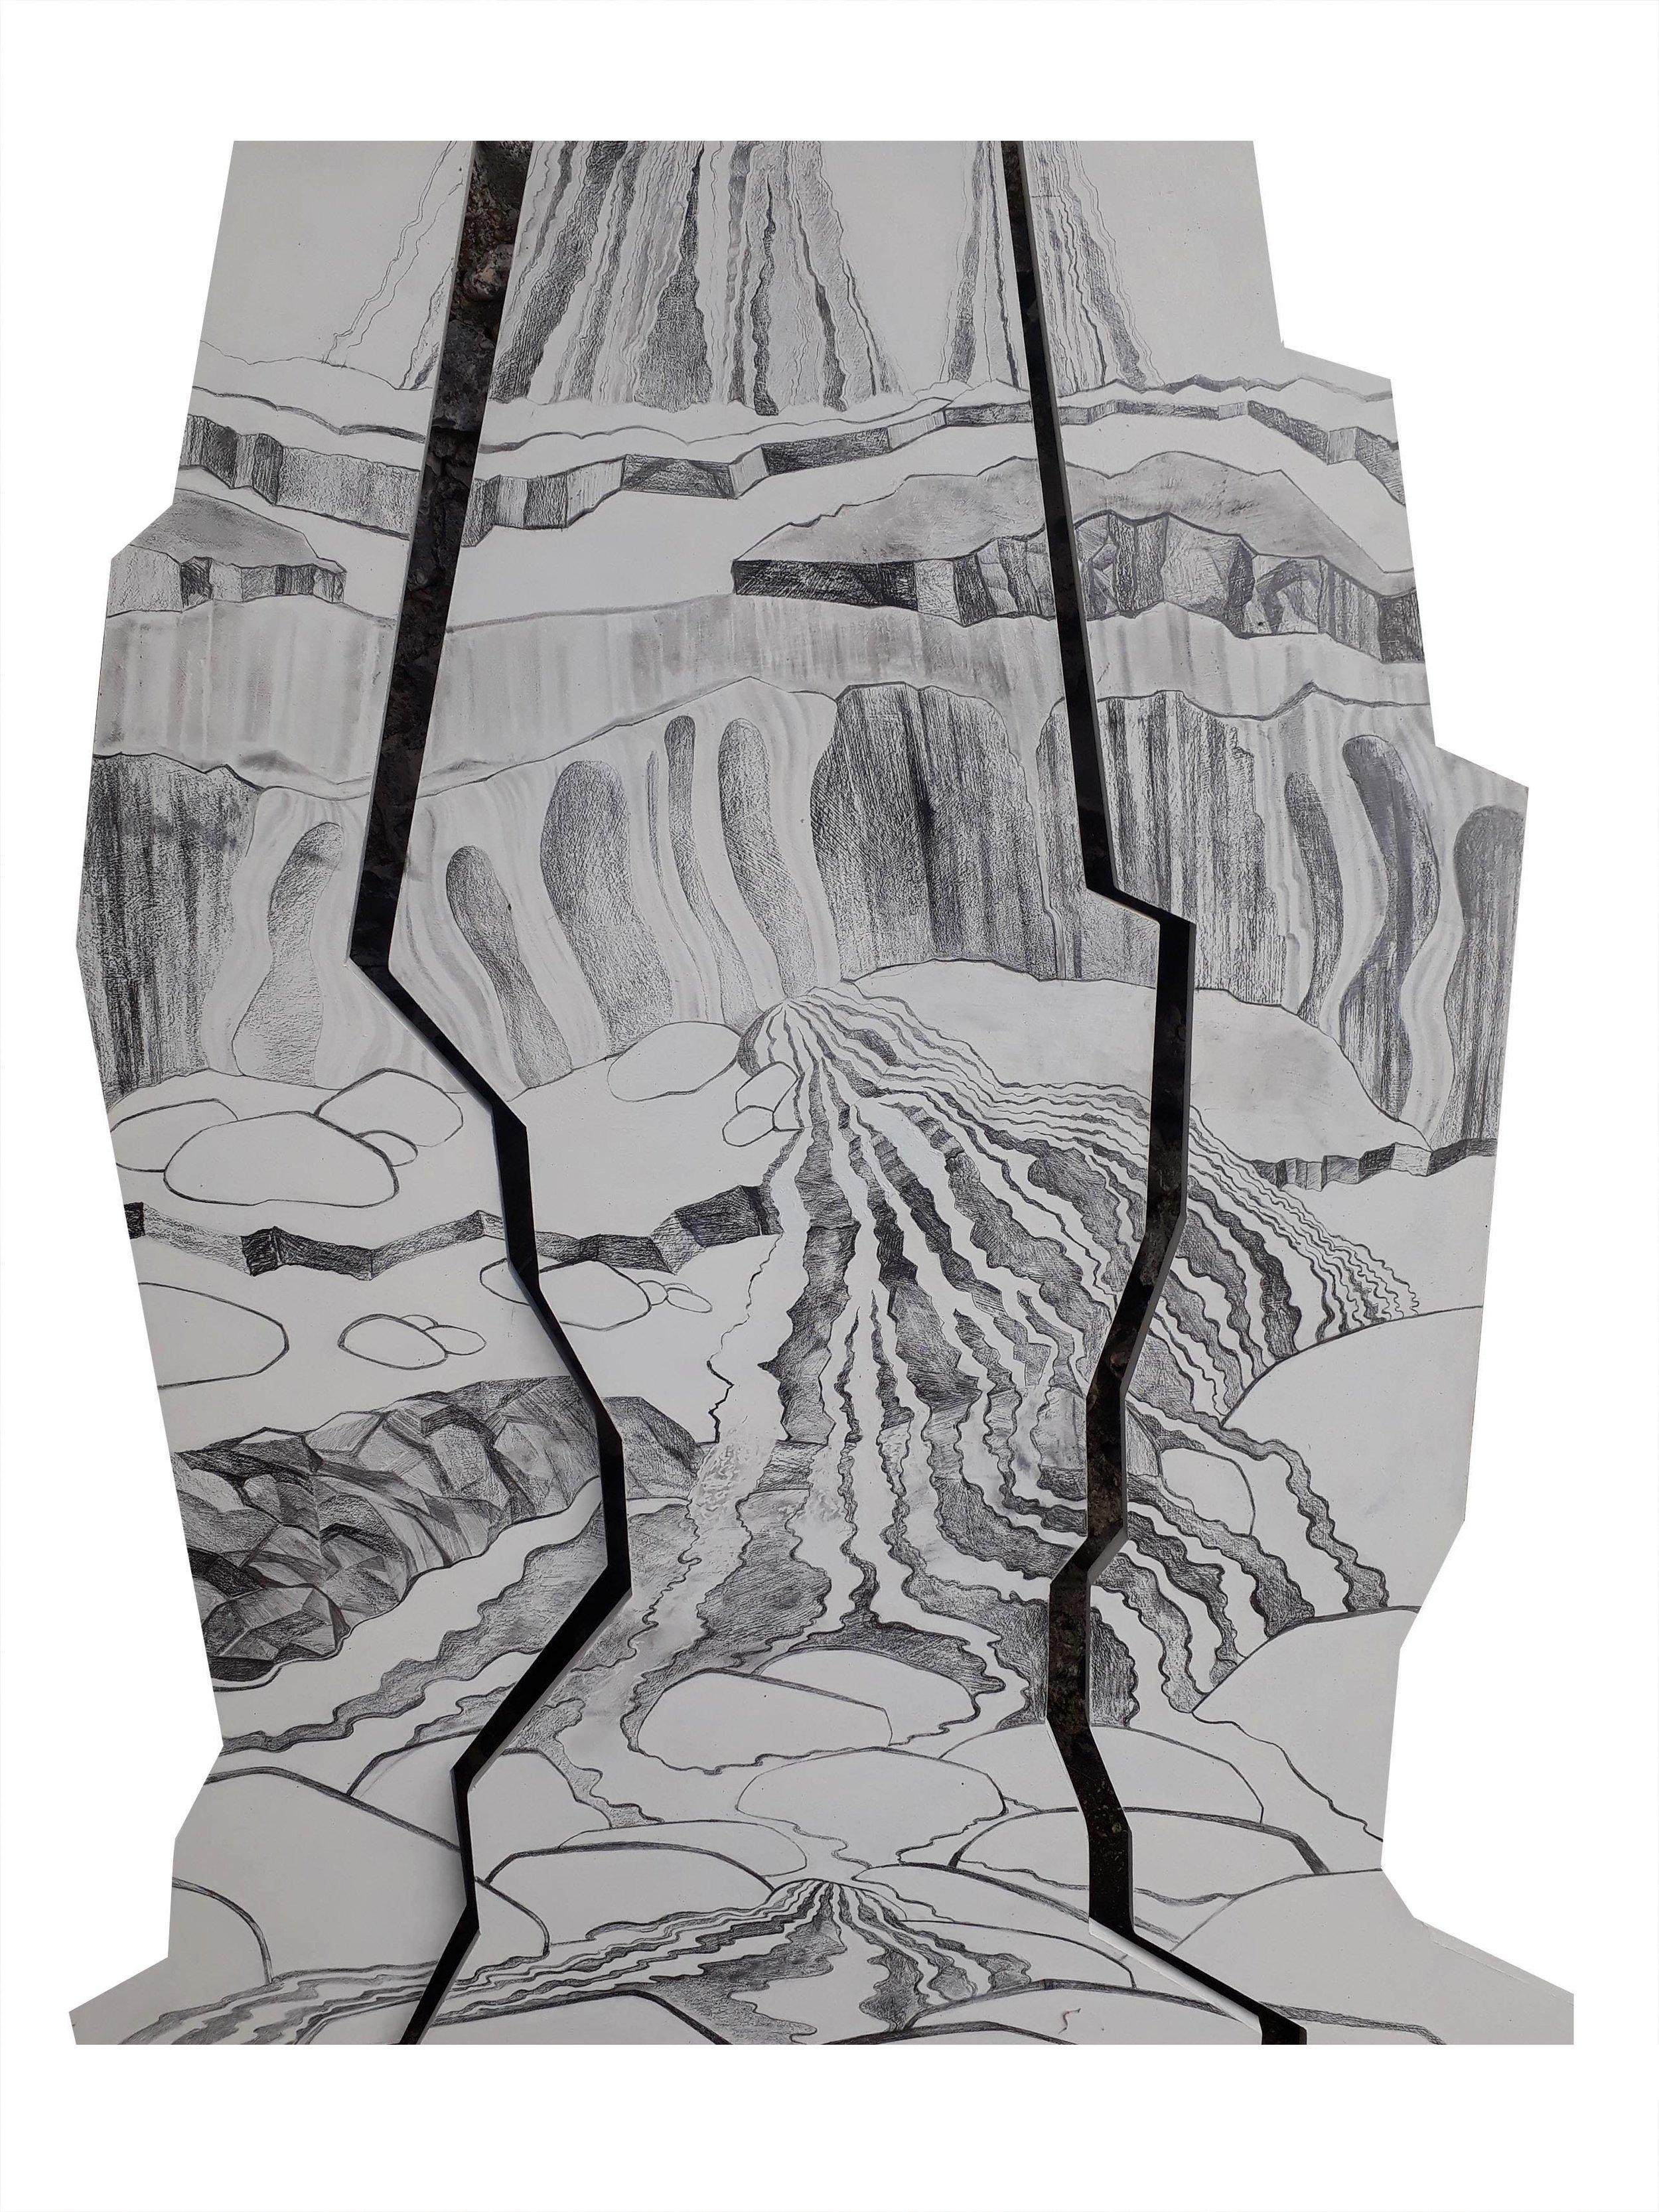 Falling Water Triptych, 2018, Graphite on MDF, 57 cm x 54 cm, $ 175 32 cm x 80 cm $125 + postage